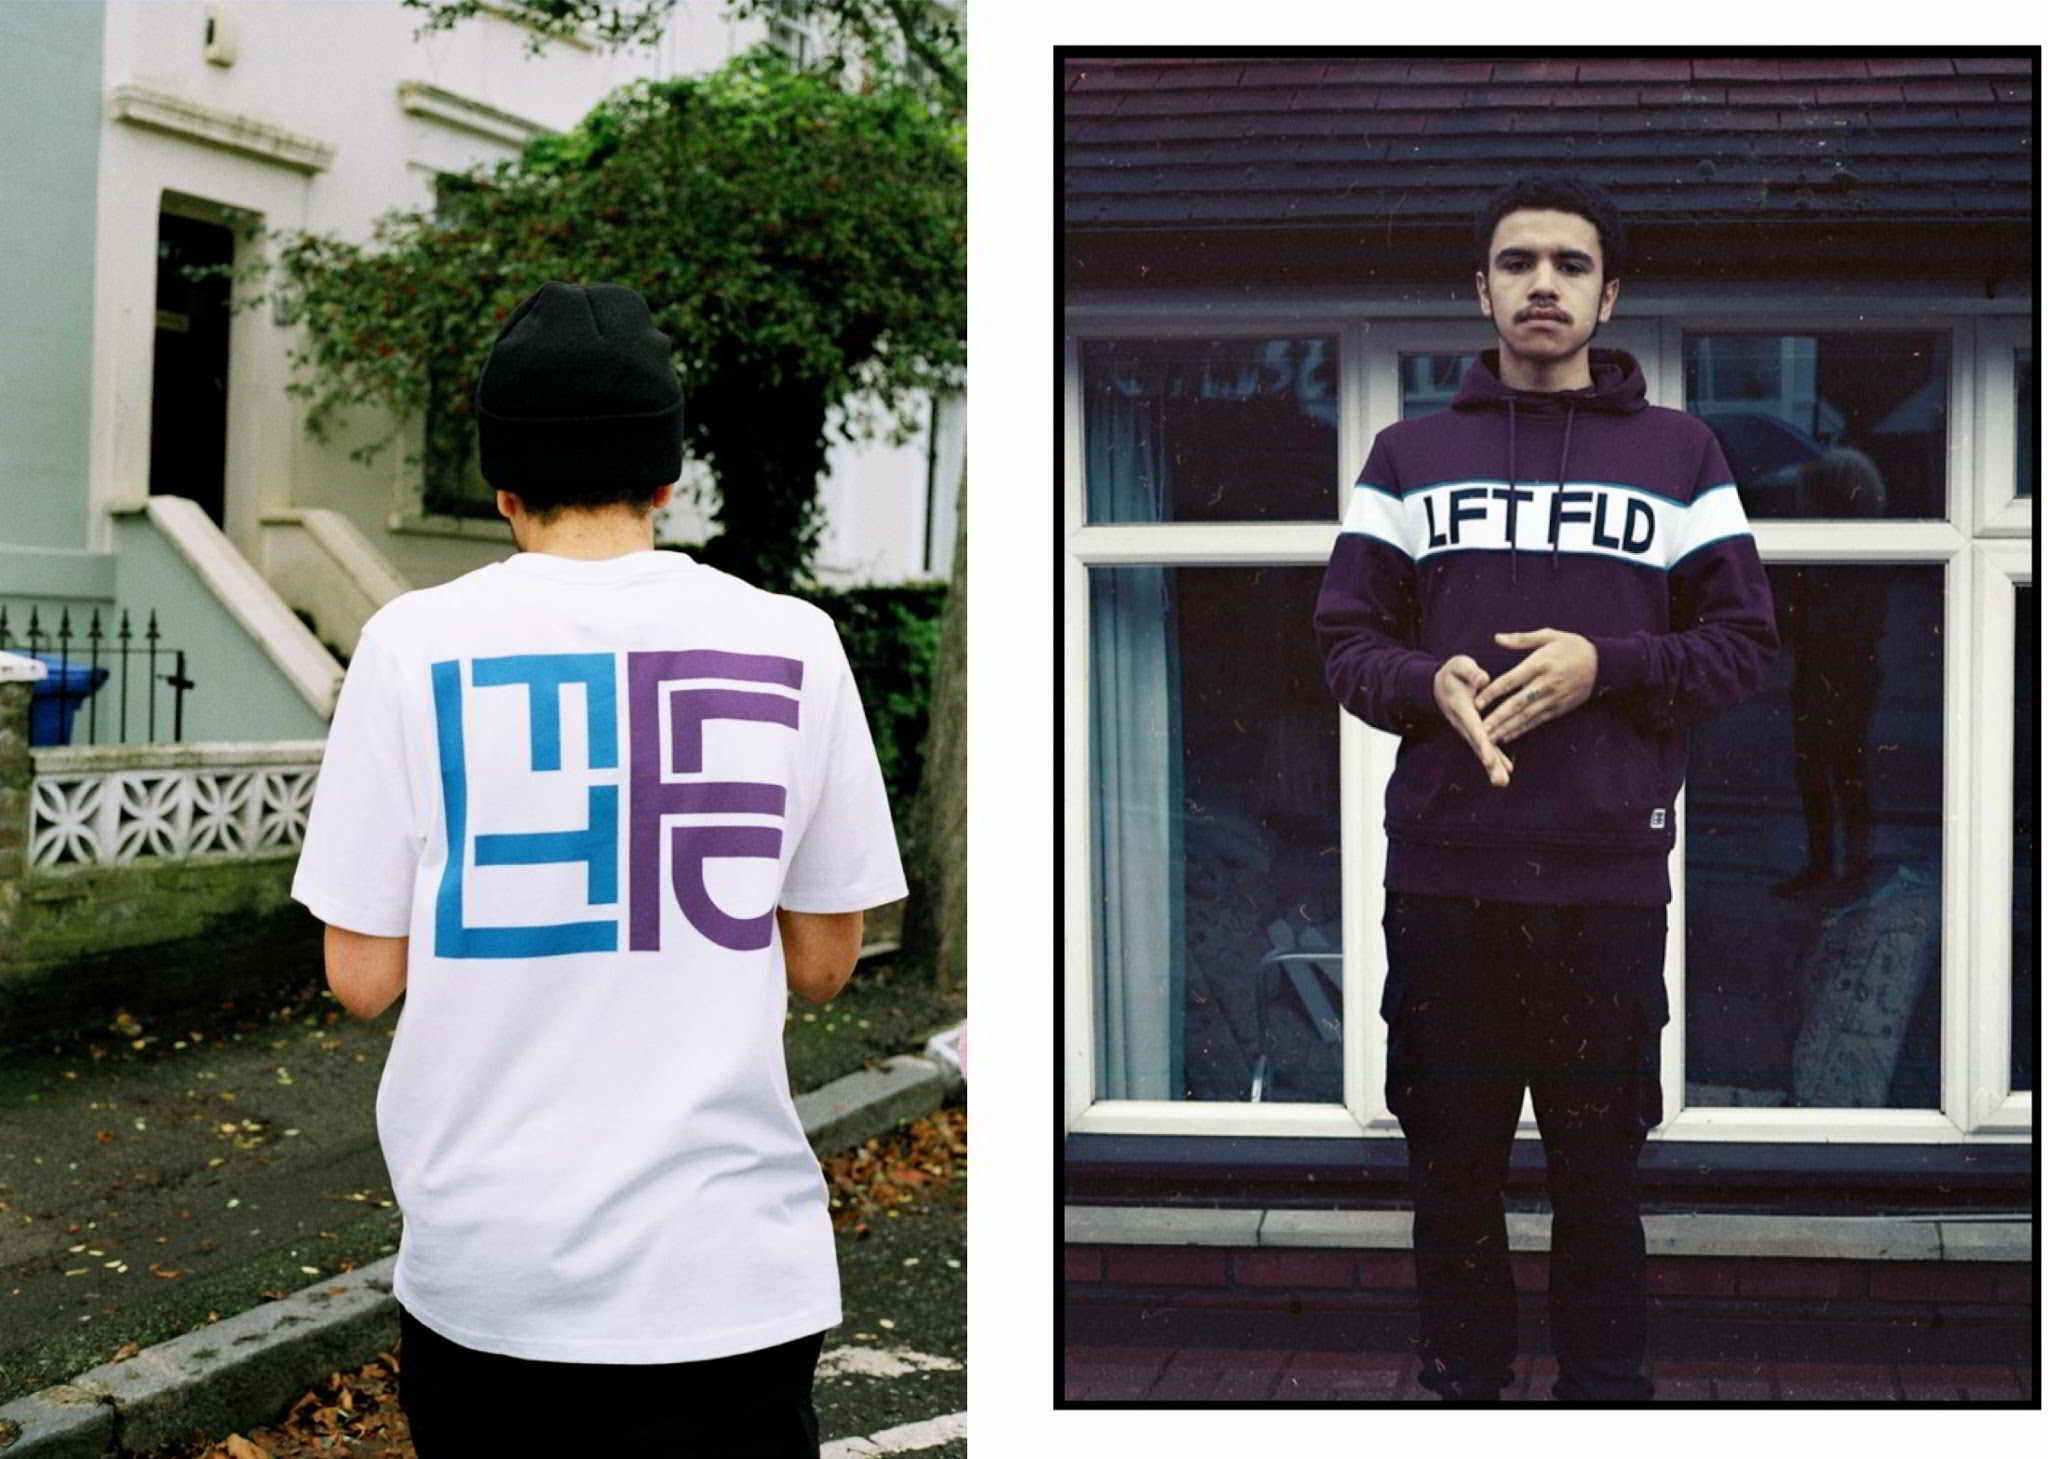 streetwear brasil lft fld outono inverno 2014 02 - LFT FLD Outono/Inverno 2014